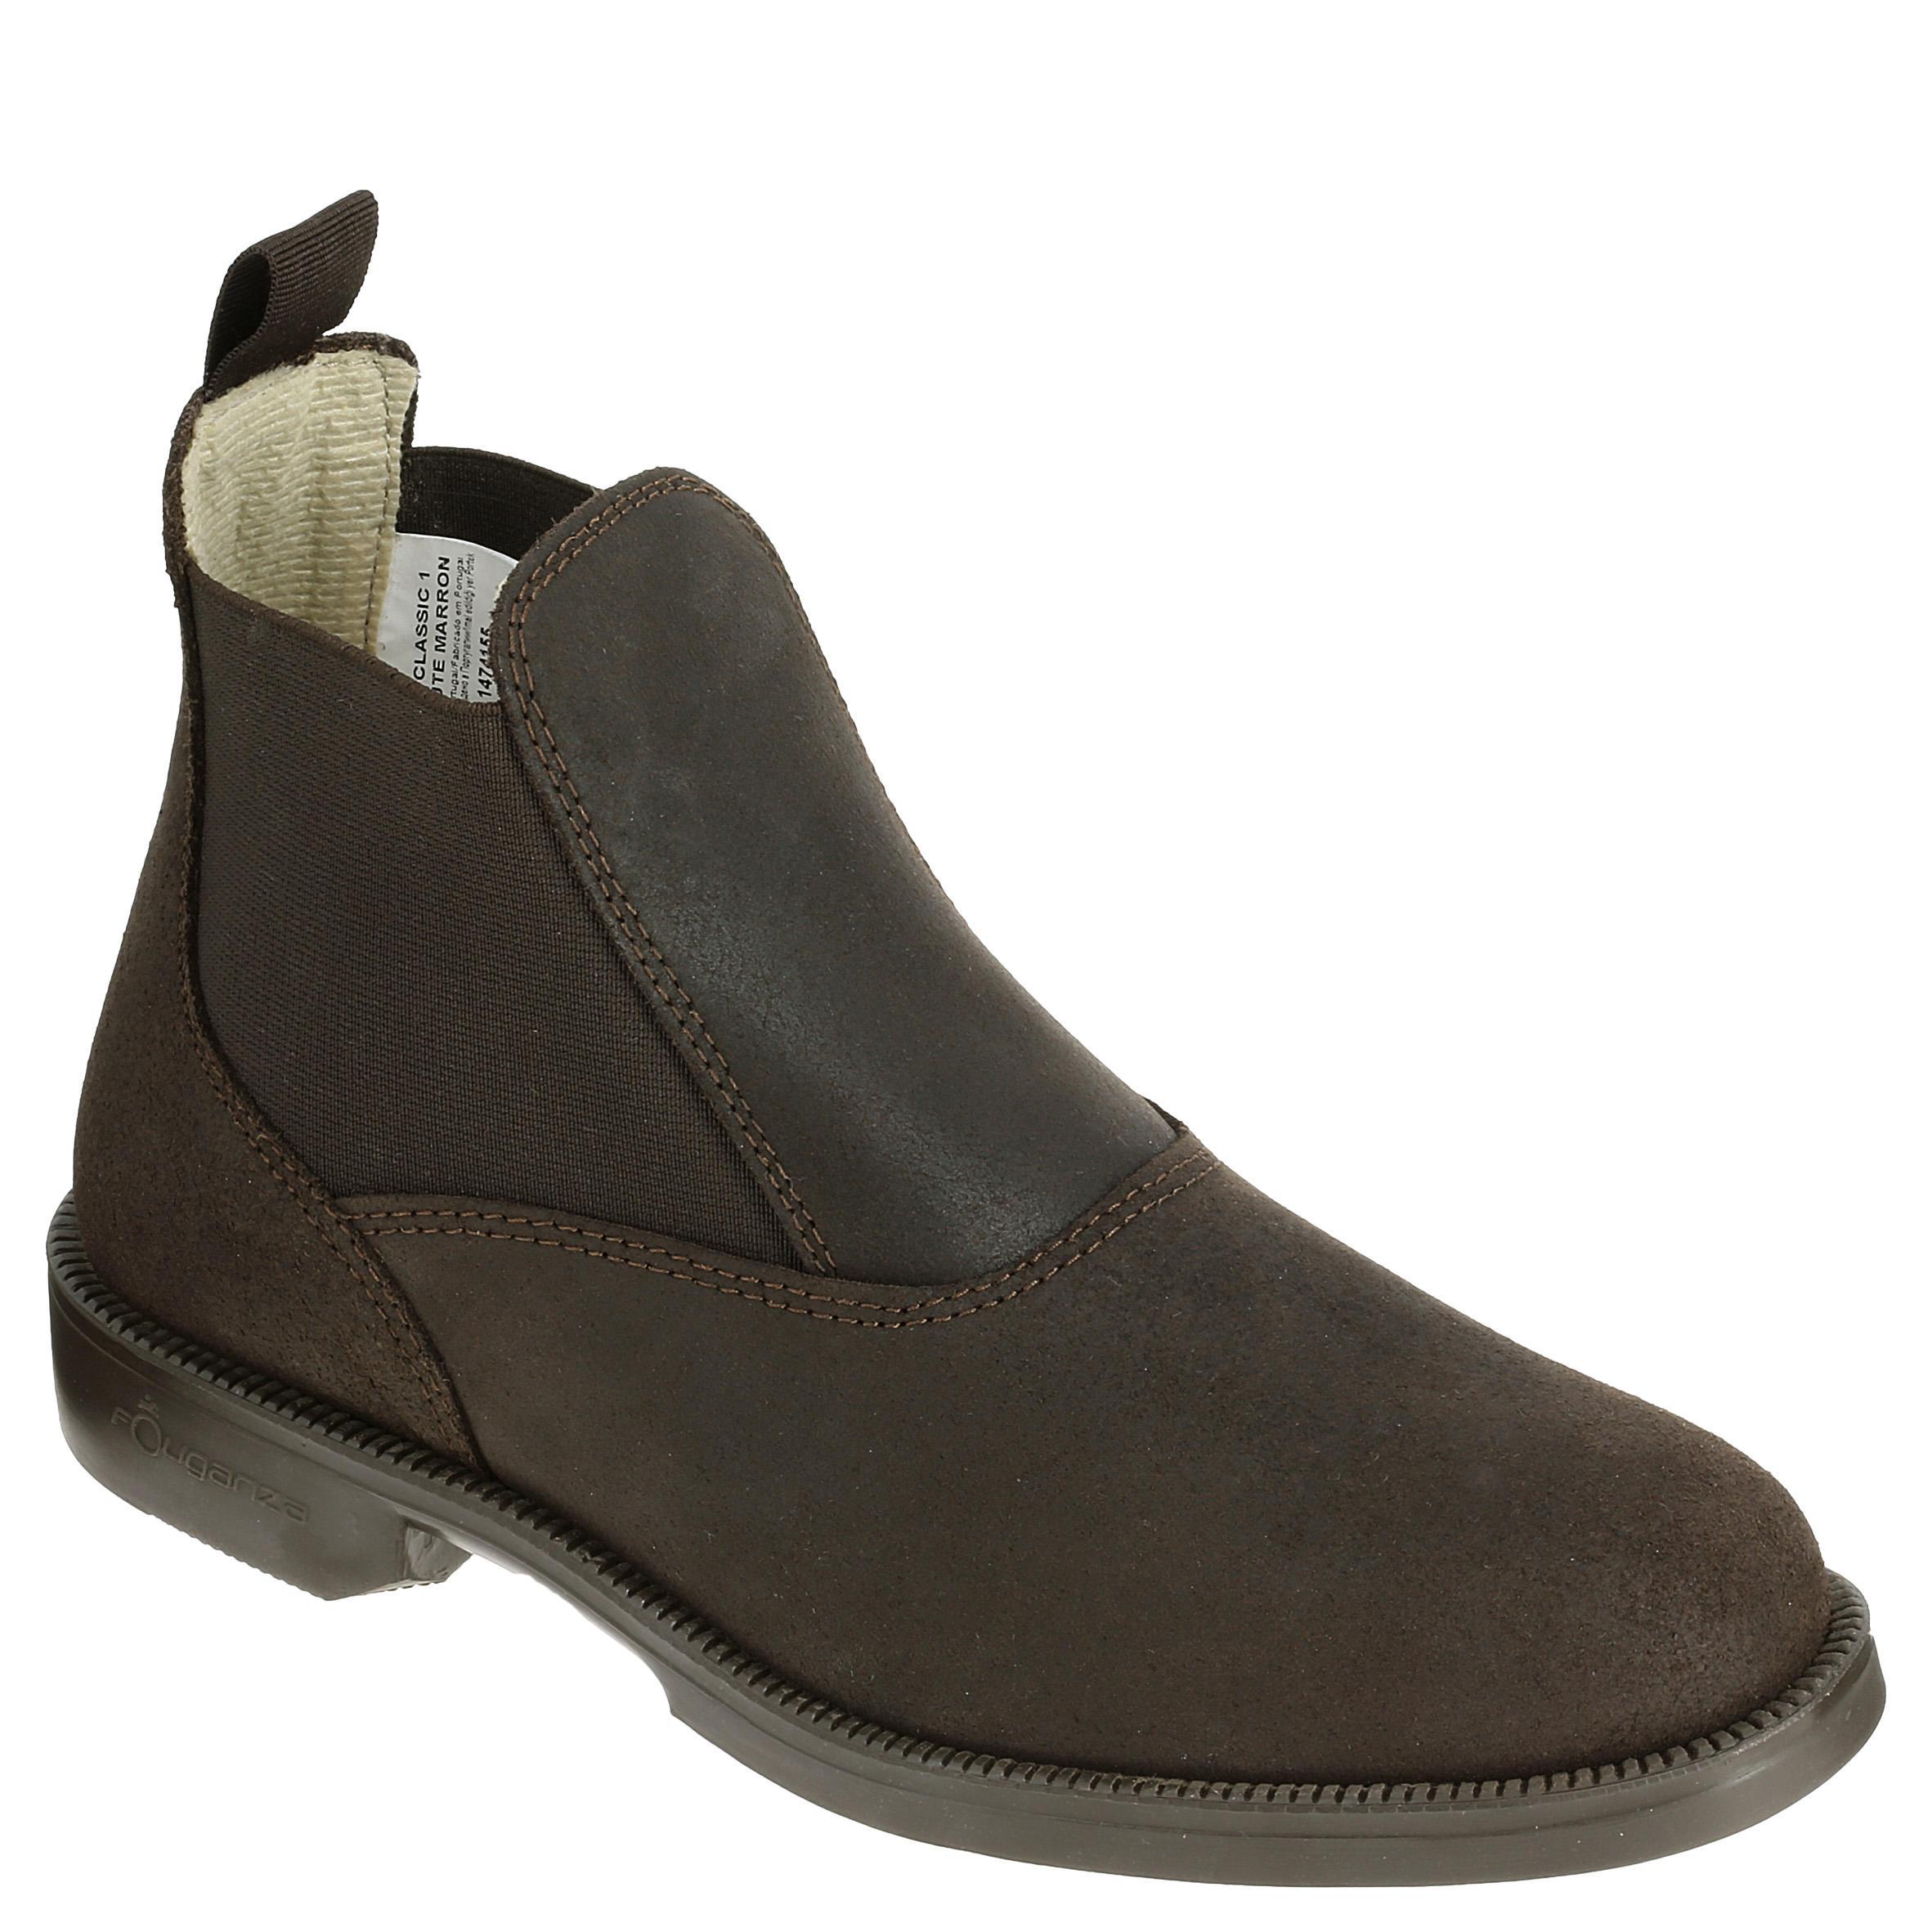 Fouganza Boots équitation adulte (taille 45 au 48) CLASSIC cuir marron - Fouganza